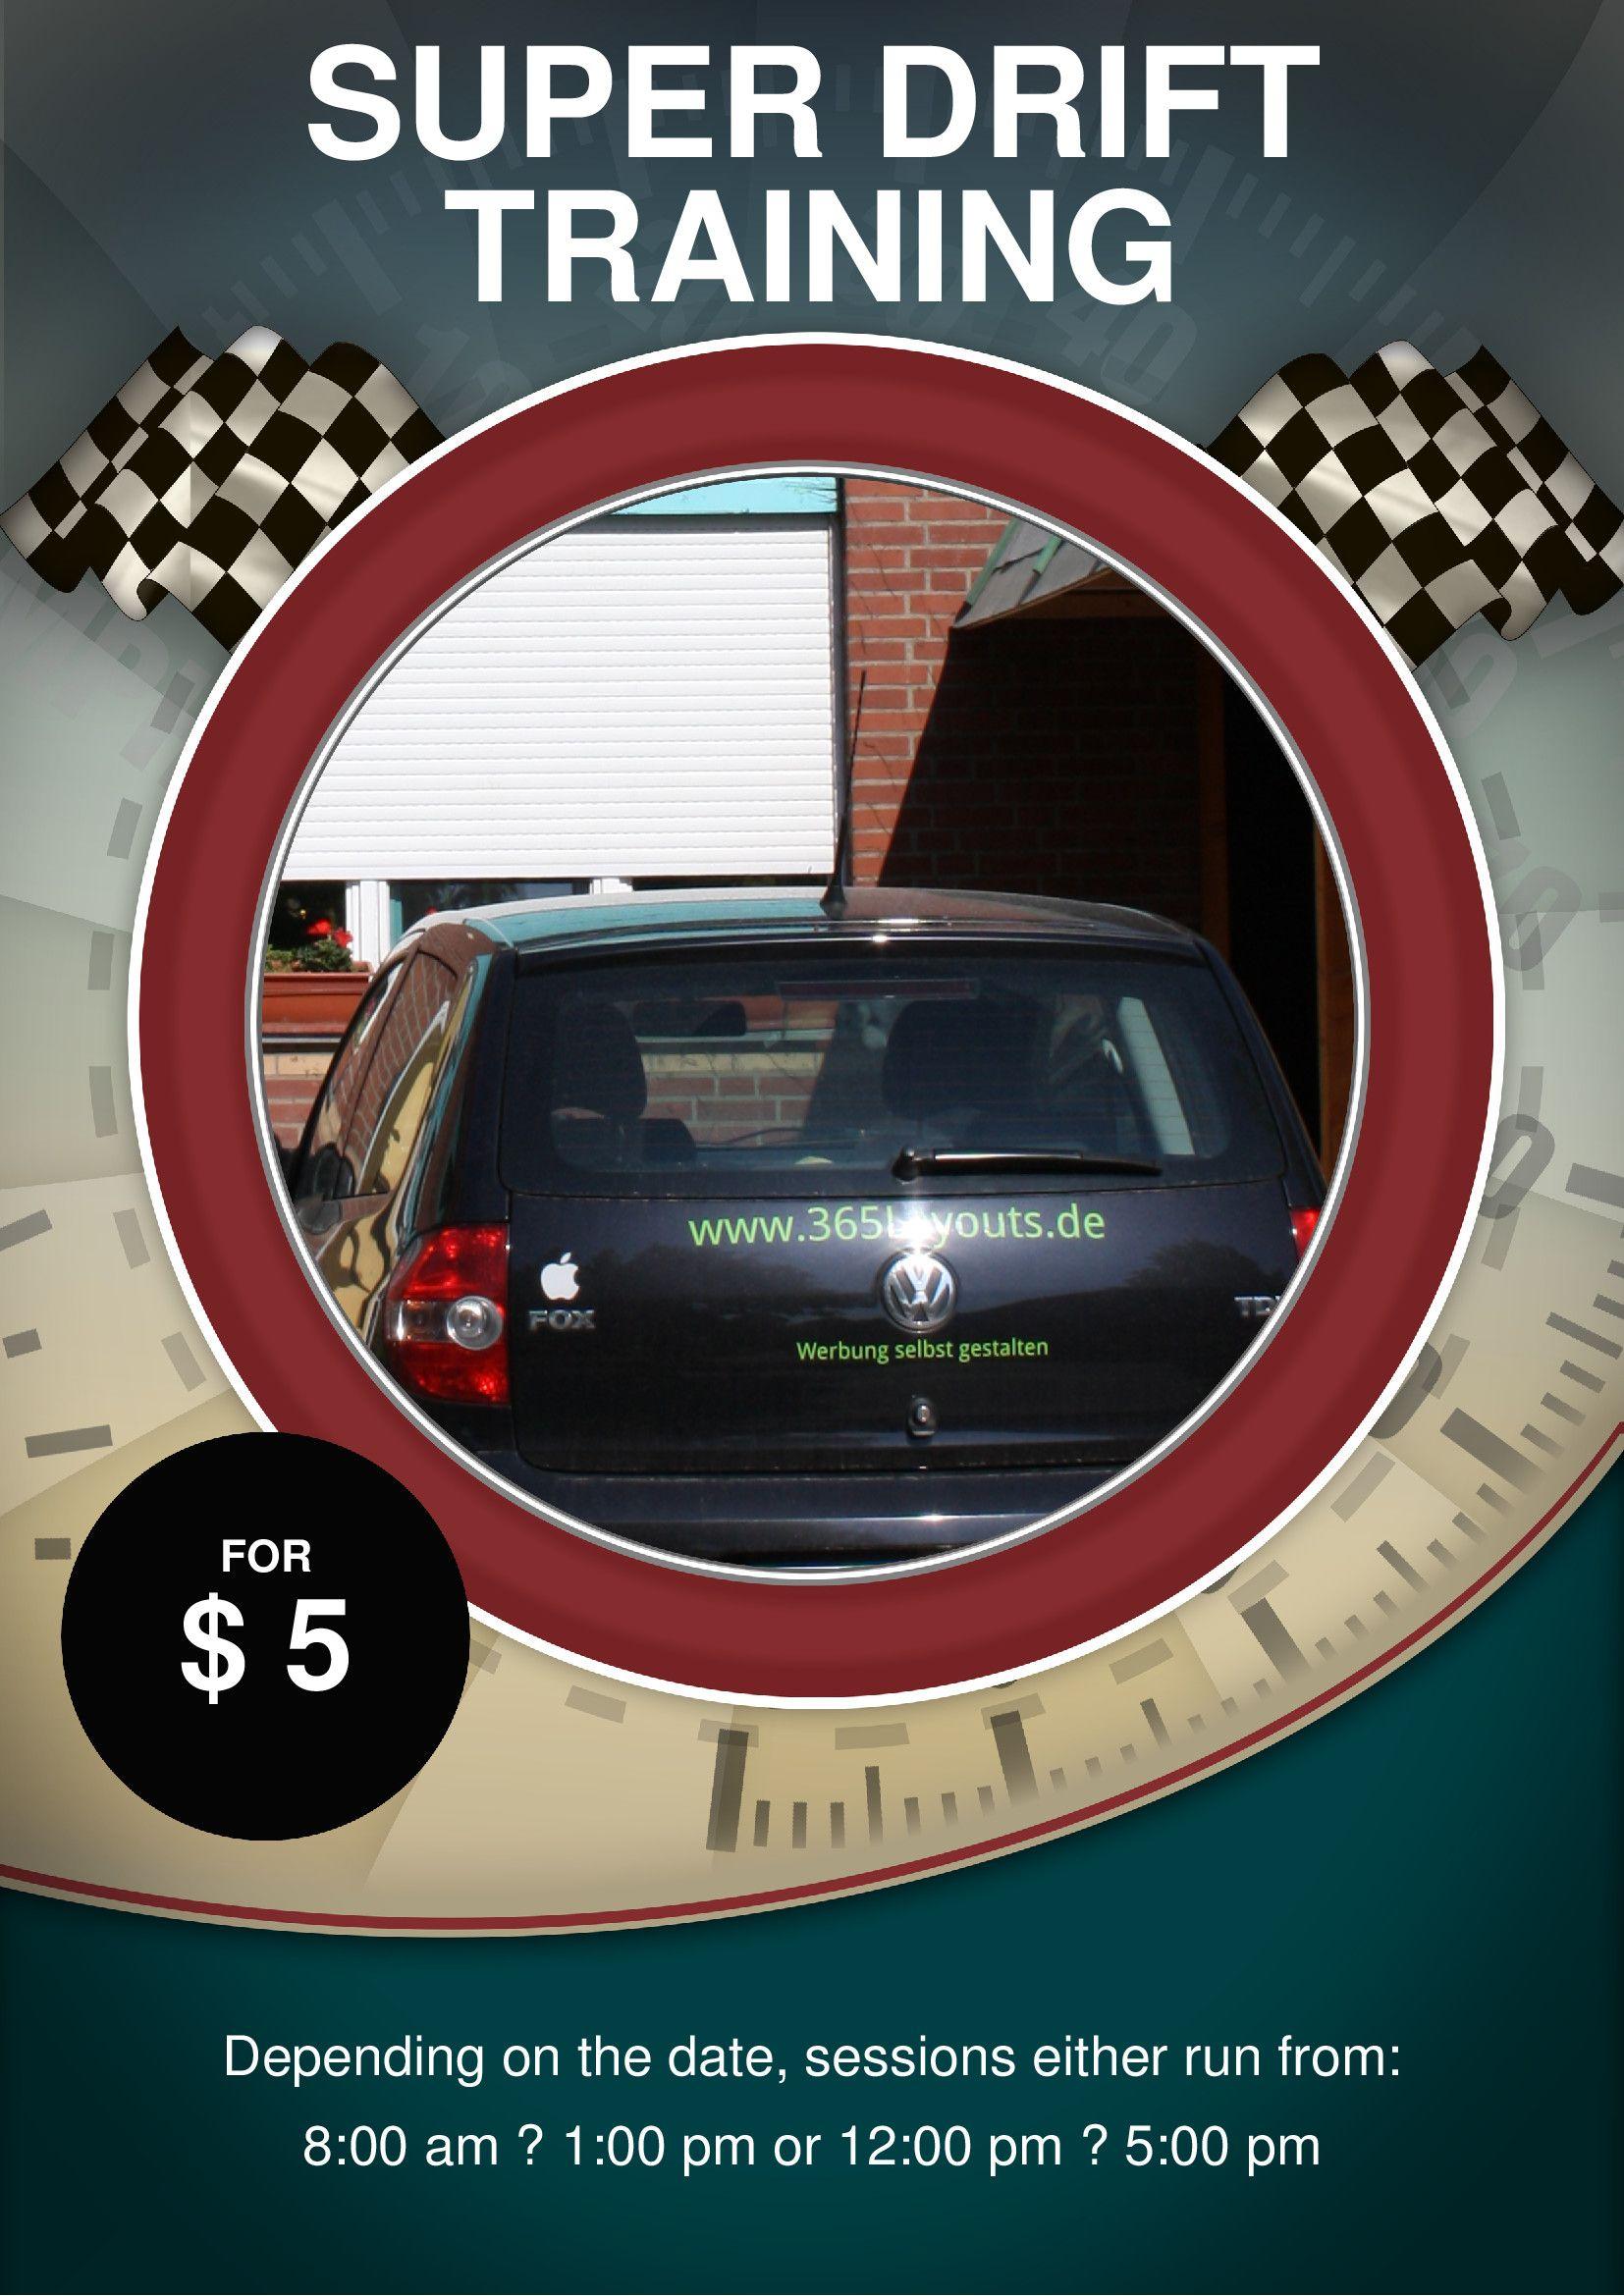 Free Driving School Flyer Template. | Flyer | Pinterest | Flyer ...